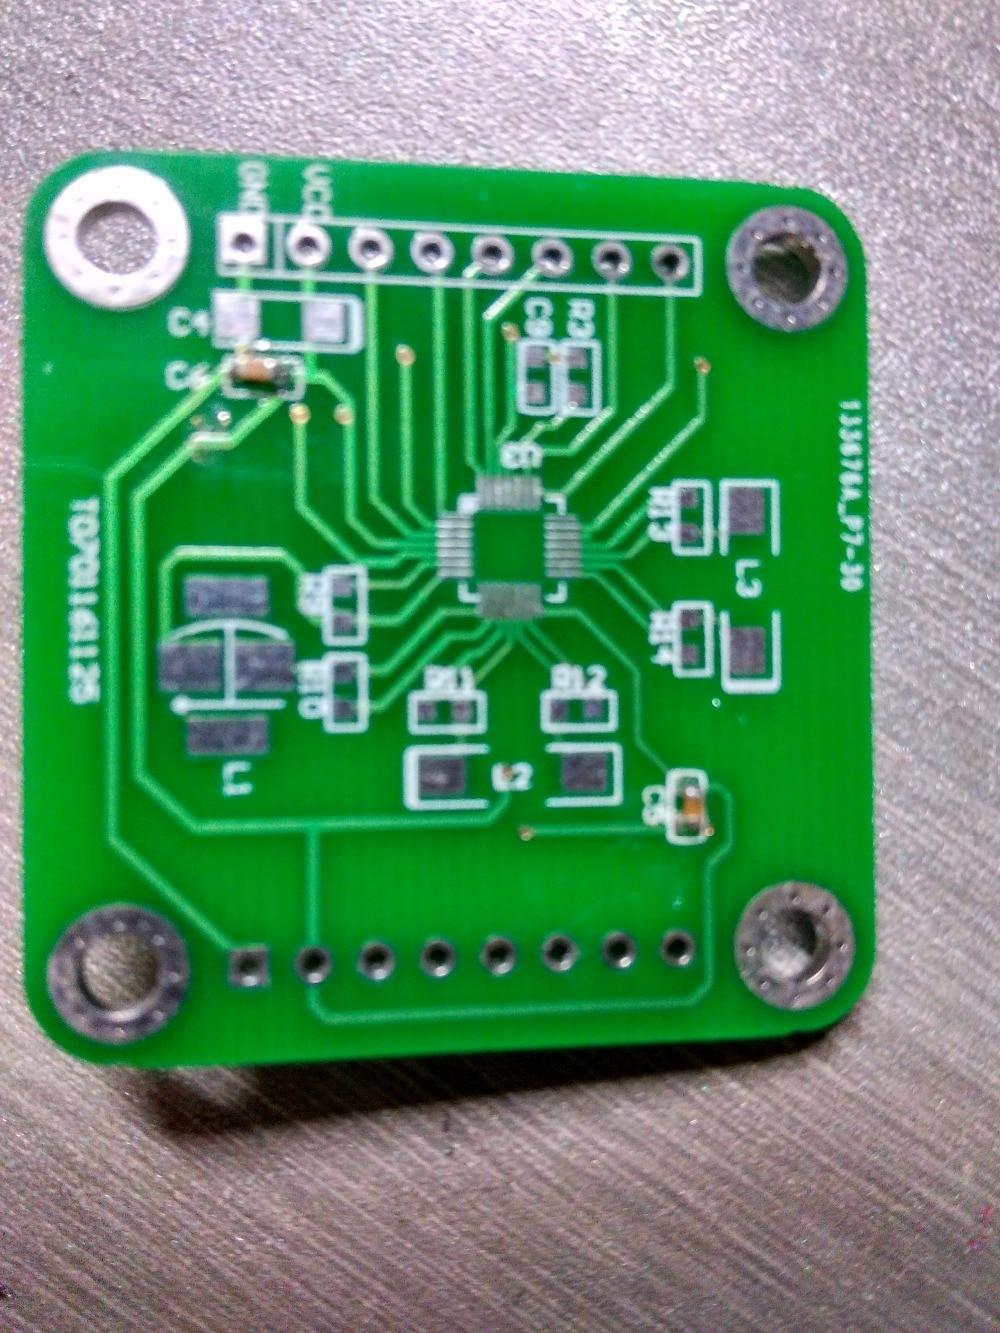 Купить с кэшбэком PNI RM3000 geomagnetic sensor module, geomagnetic detection PCB, development board 129271310413101